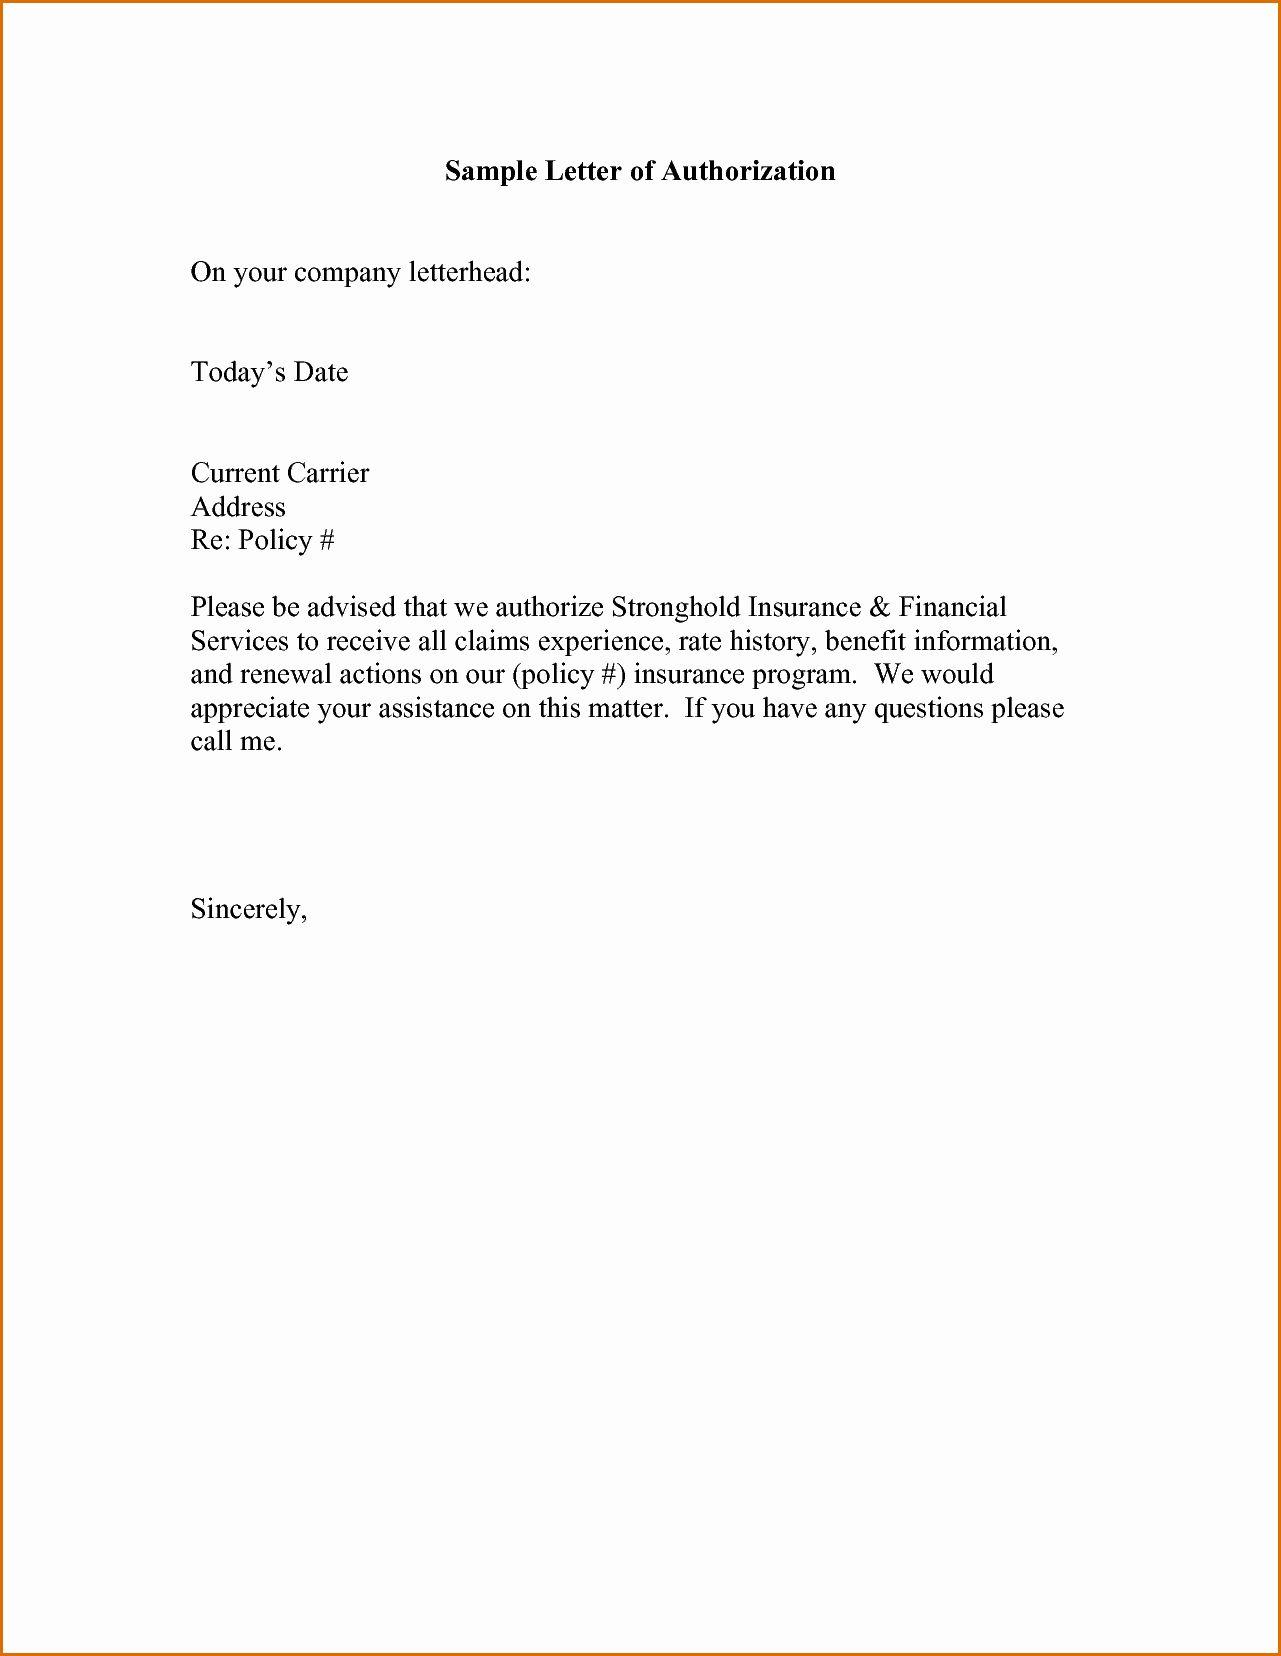 Manufacturers Representative Agreements Best Of 9 Authorization Sample Letters Letter Format Sample Lettering Letter Sample